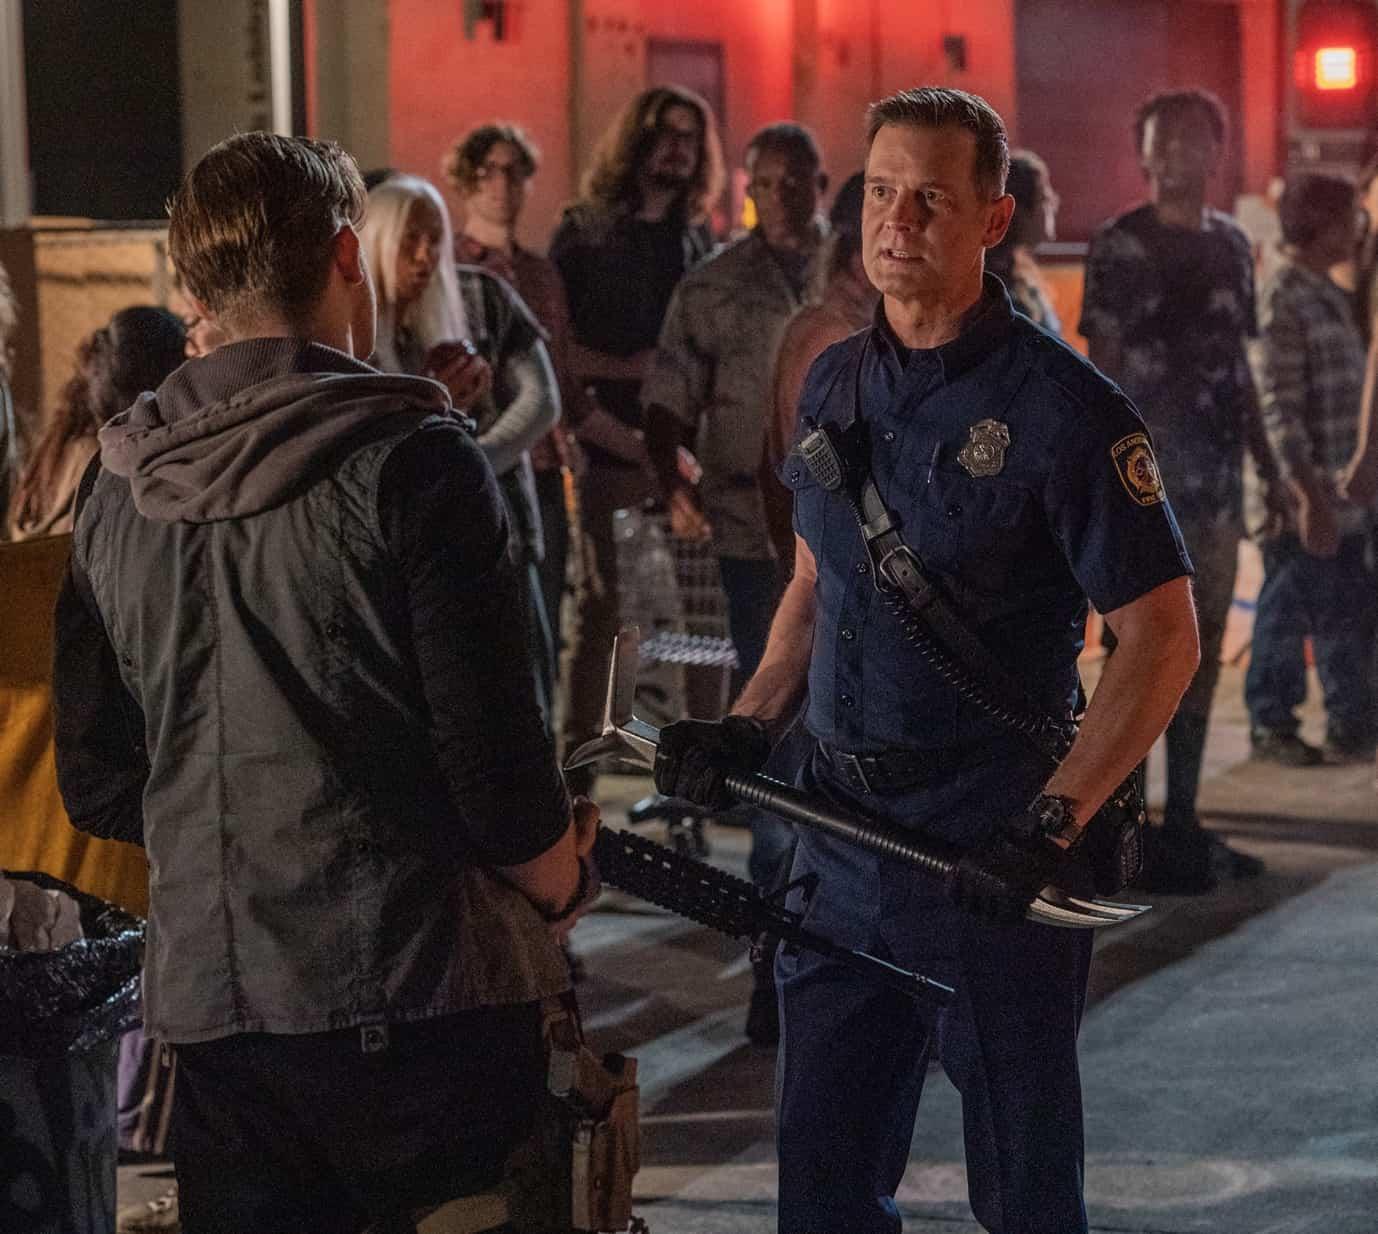 "911 Season 5 Episode 3 : Peter Krause in the ""Desperate Measures"" episode of 9-1-1 airing Monday, Oct. 4 (8:00-9:00 PM ET/PT) on FOX. © 2021 FOX MEDIA LLC. CR: Jack Zeman /FOX."